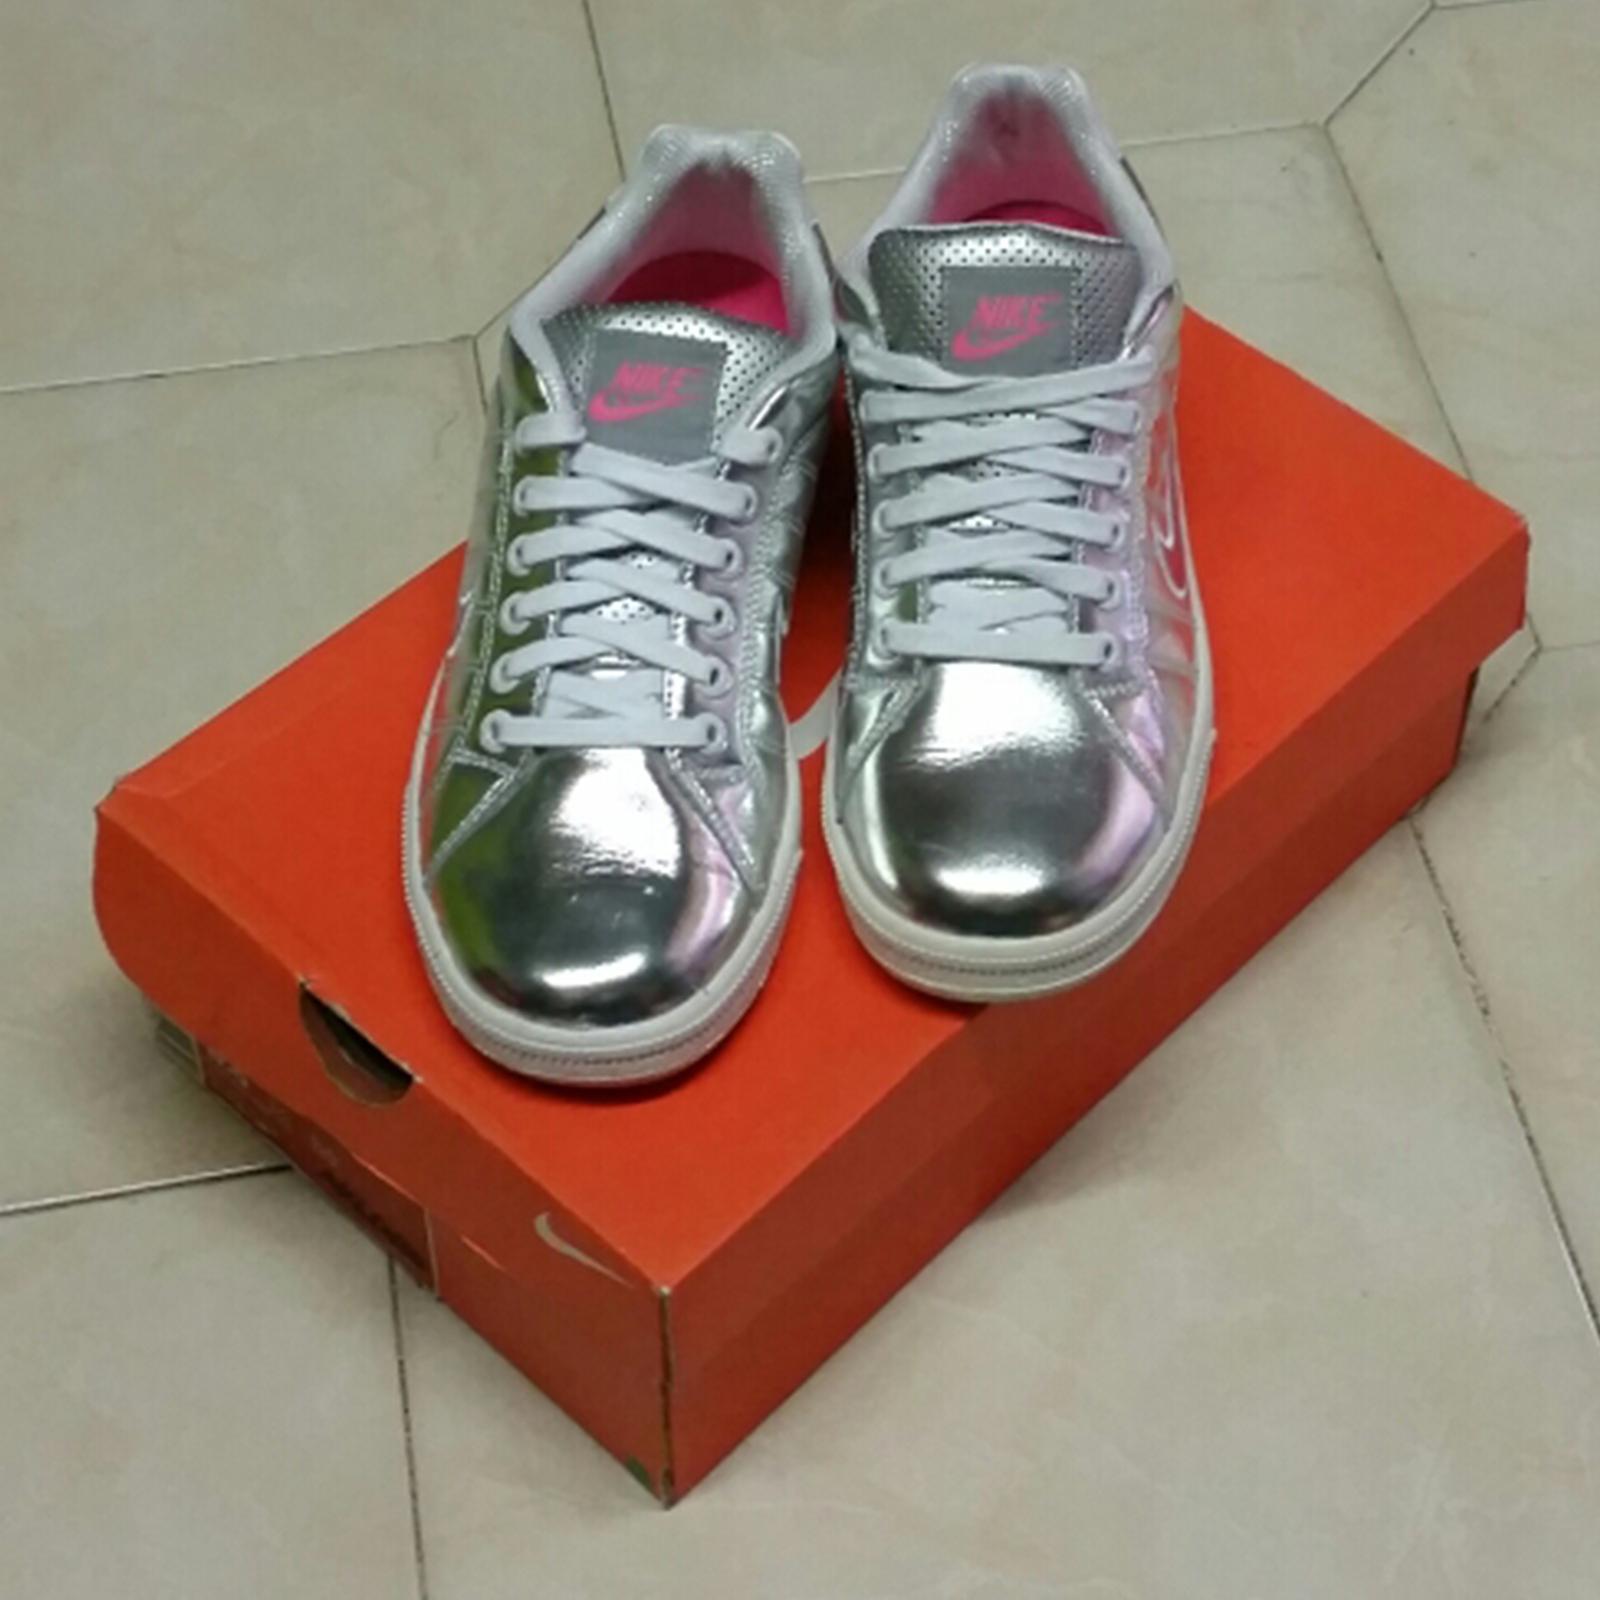 Nike - Sneaker basso in pelle argenteo e rifiniture fucsia